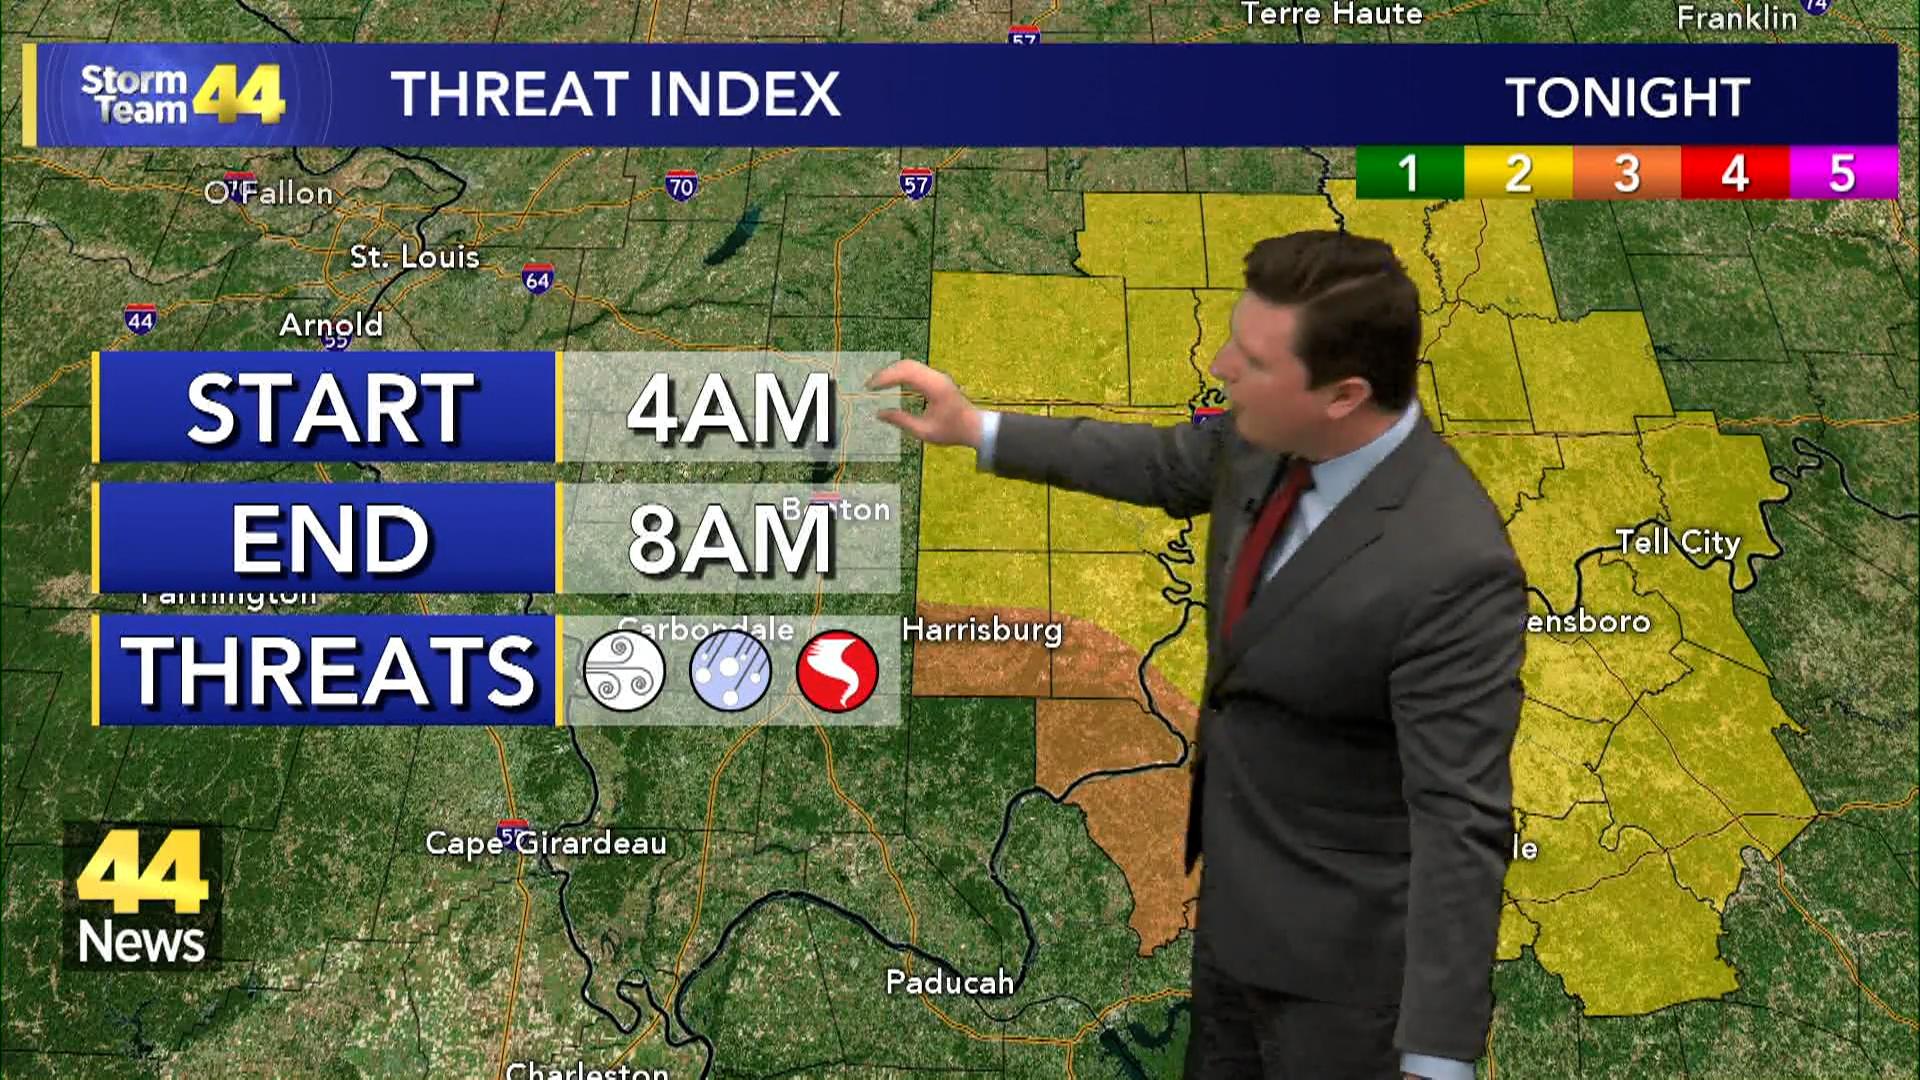 Image for Storm Team 44 Monday Evening Forecast